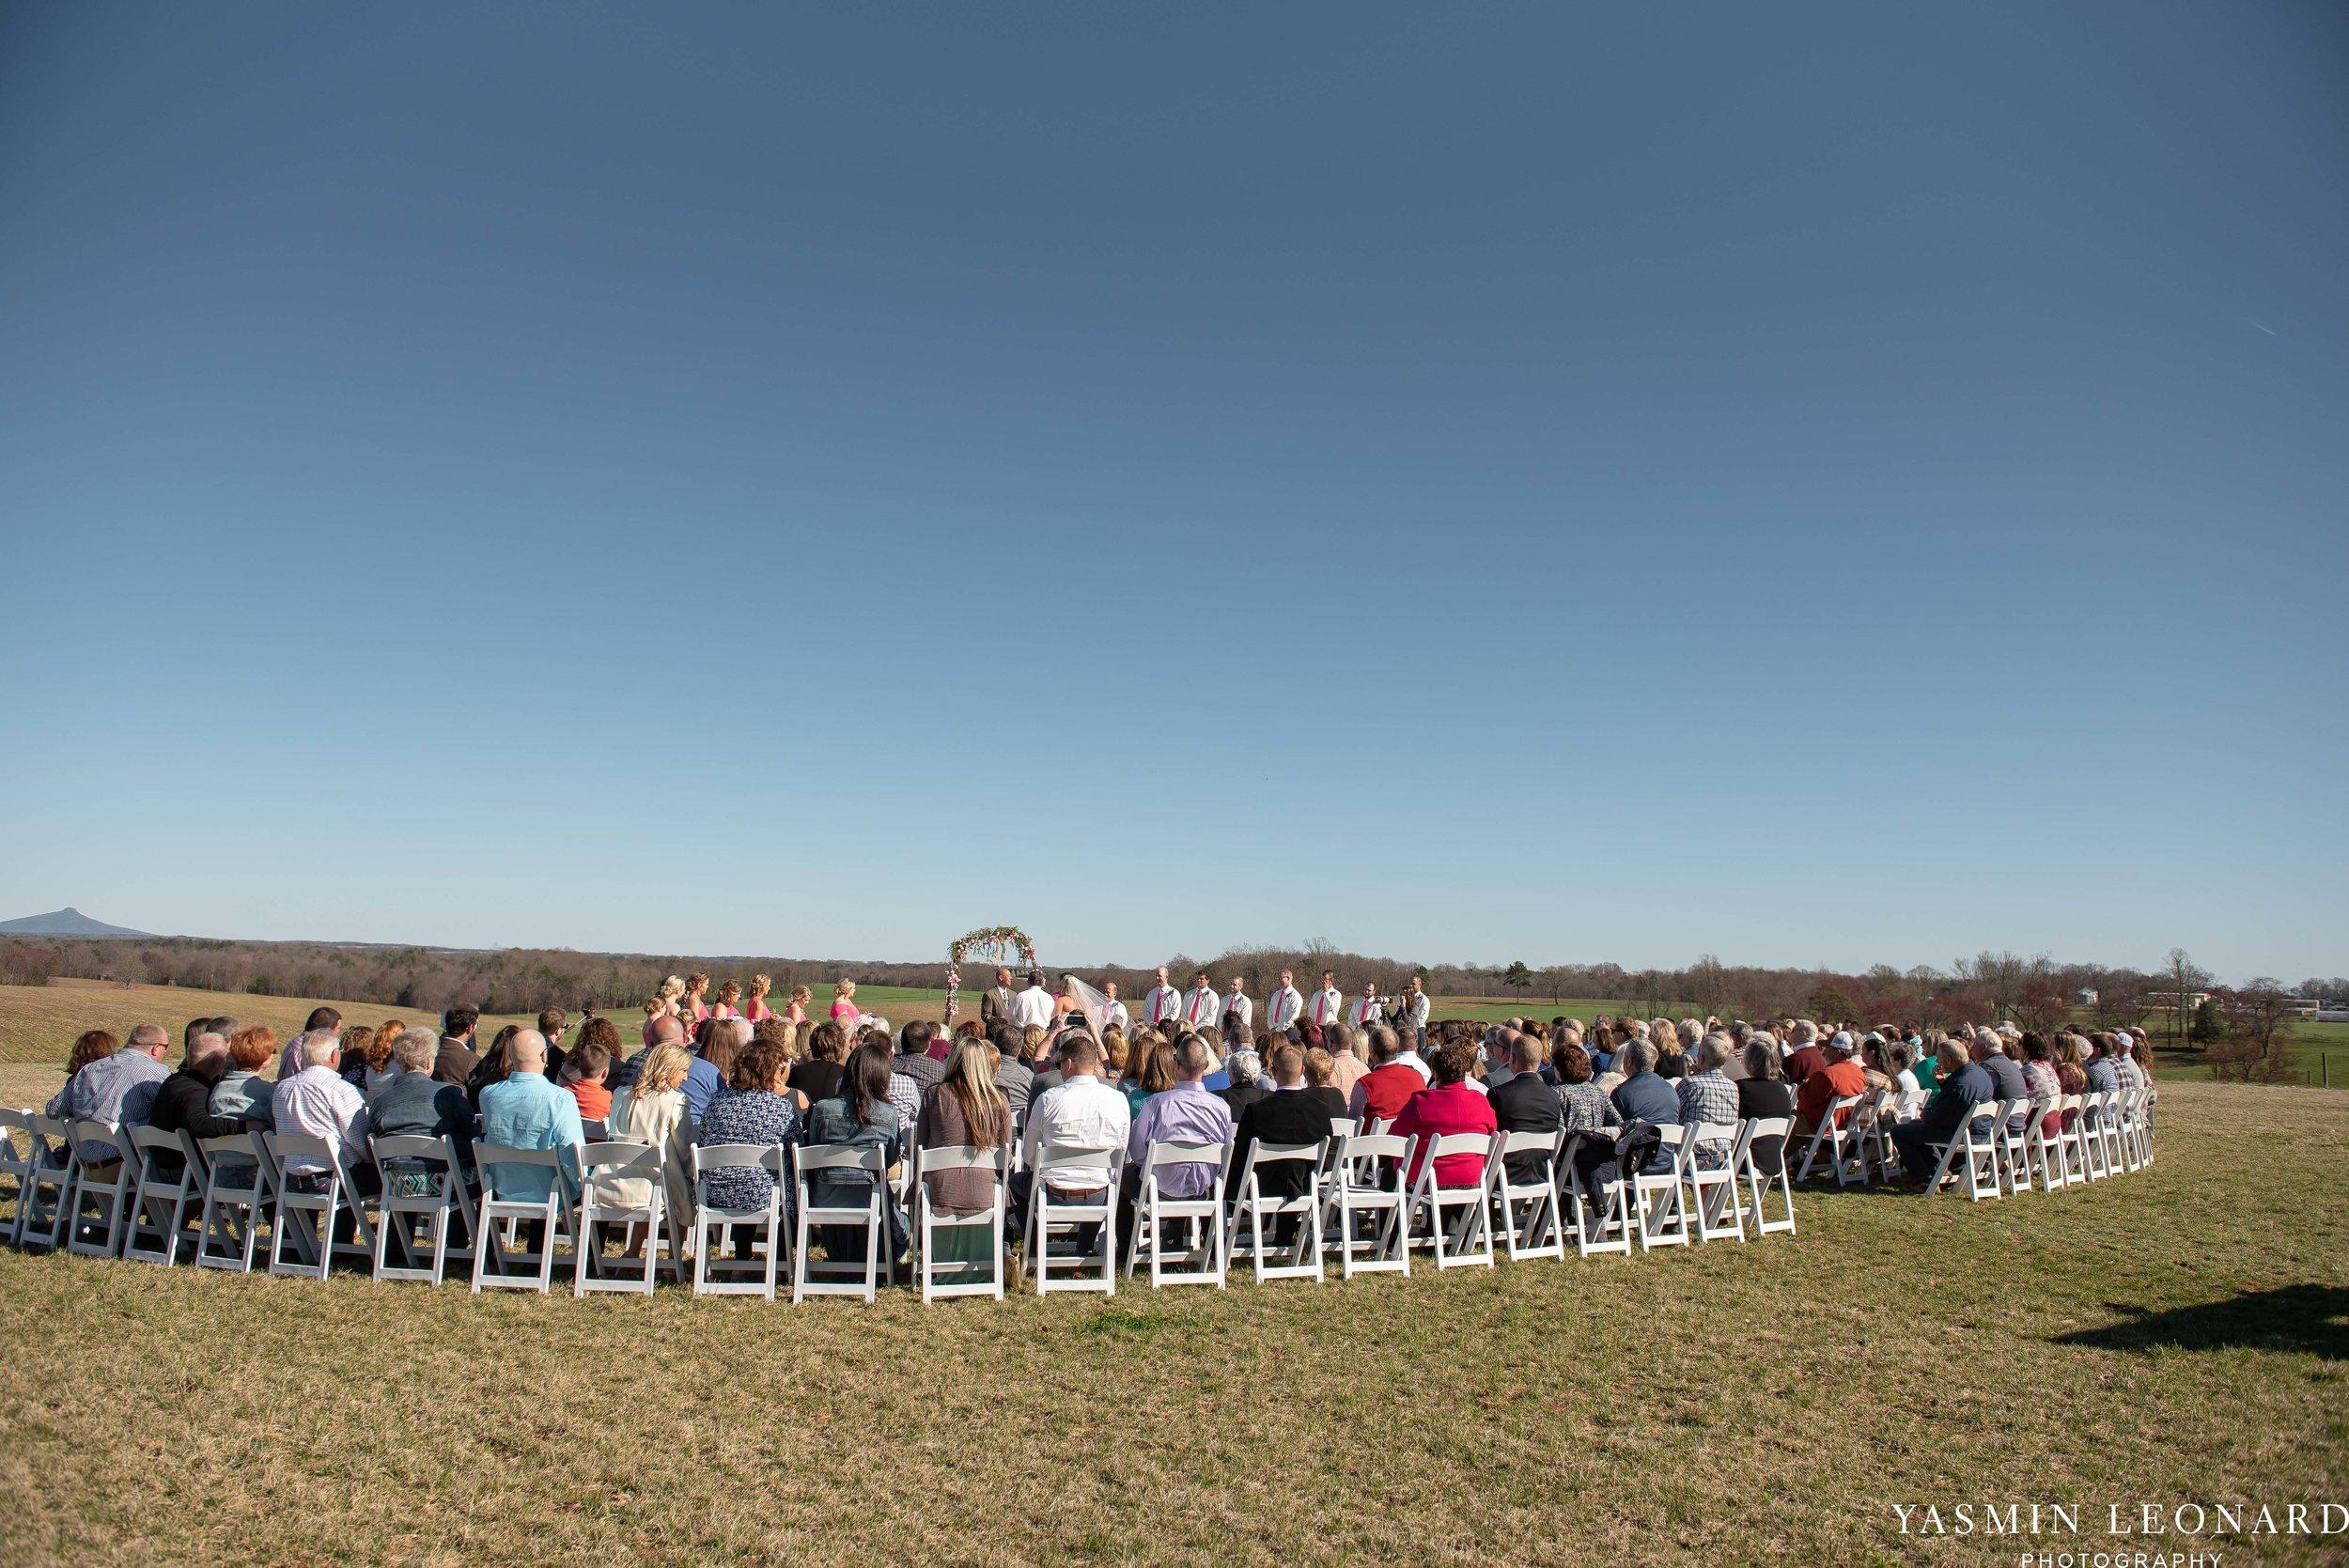 The Barn at Heritage Farm - Country Wedding - Pink and Blue Wedding - Barn Wedding - Outdoor Wedding - Cotton and Wheat Decor - Groom in Bibs - Pink Bridal Colors - Yasmin Leonard Photography-12.jpg